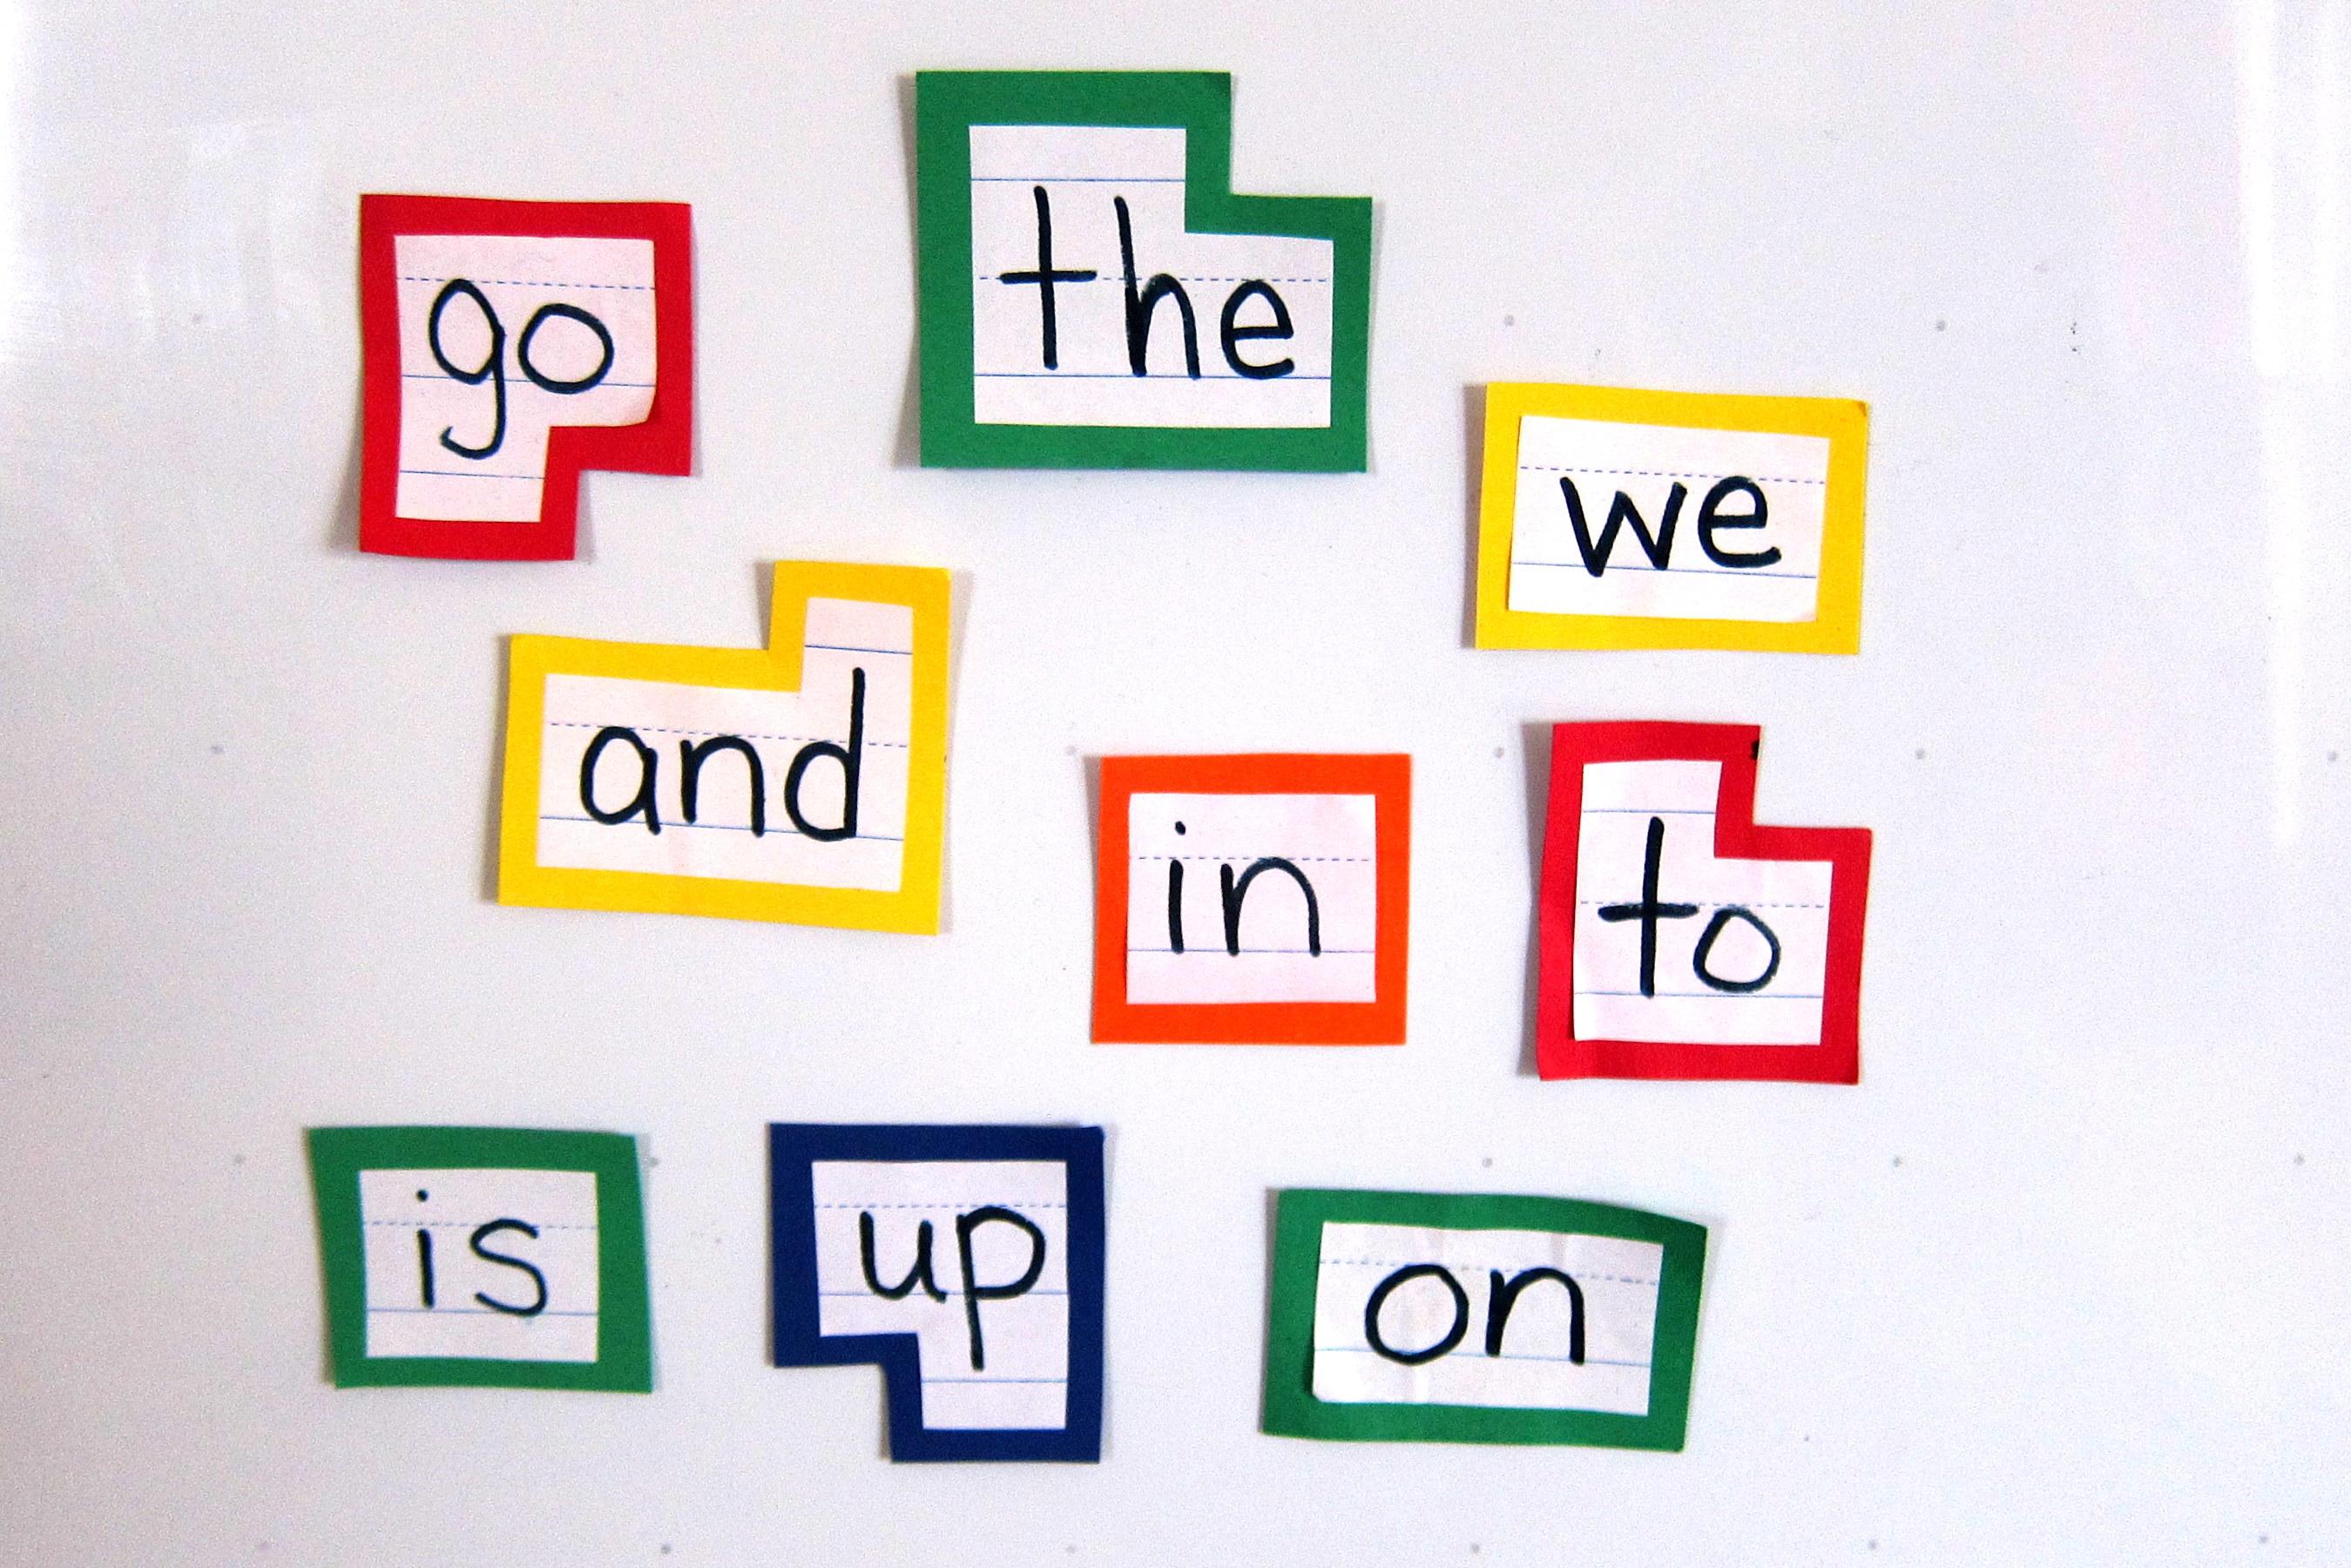 Sight Word Clip Art A New Sight Word-Sight Word Clip Art A New Sight Word-17